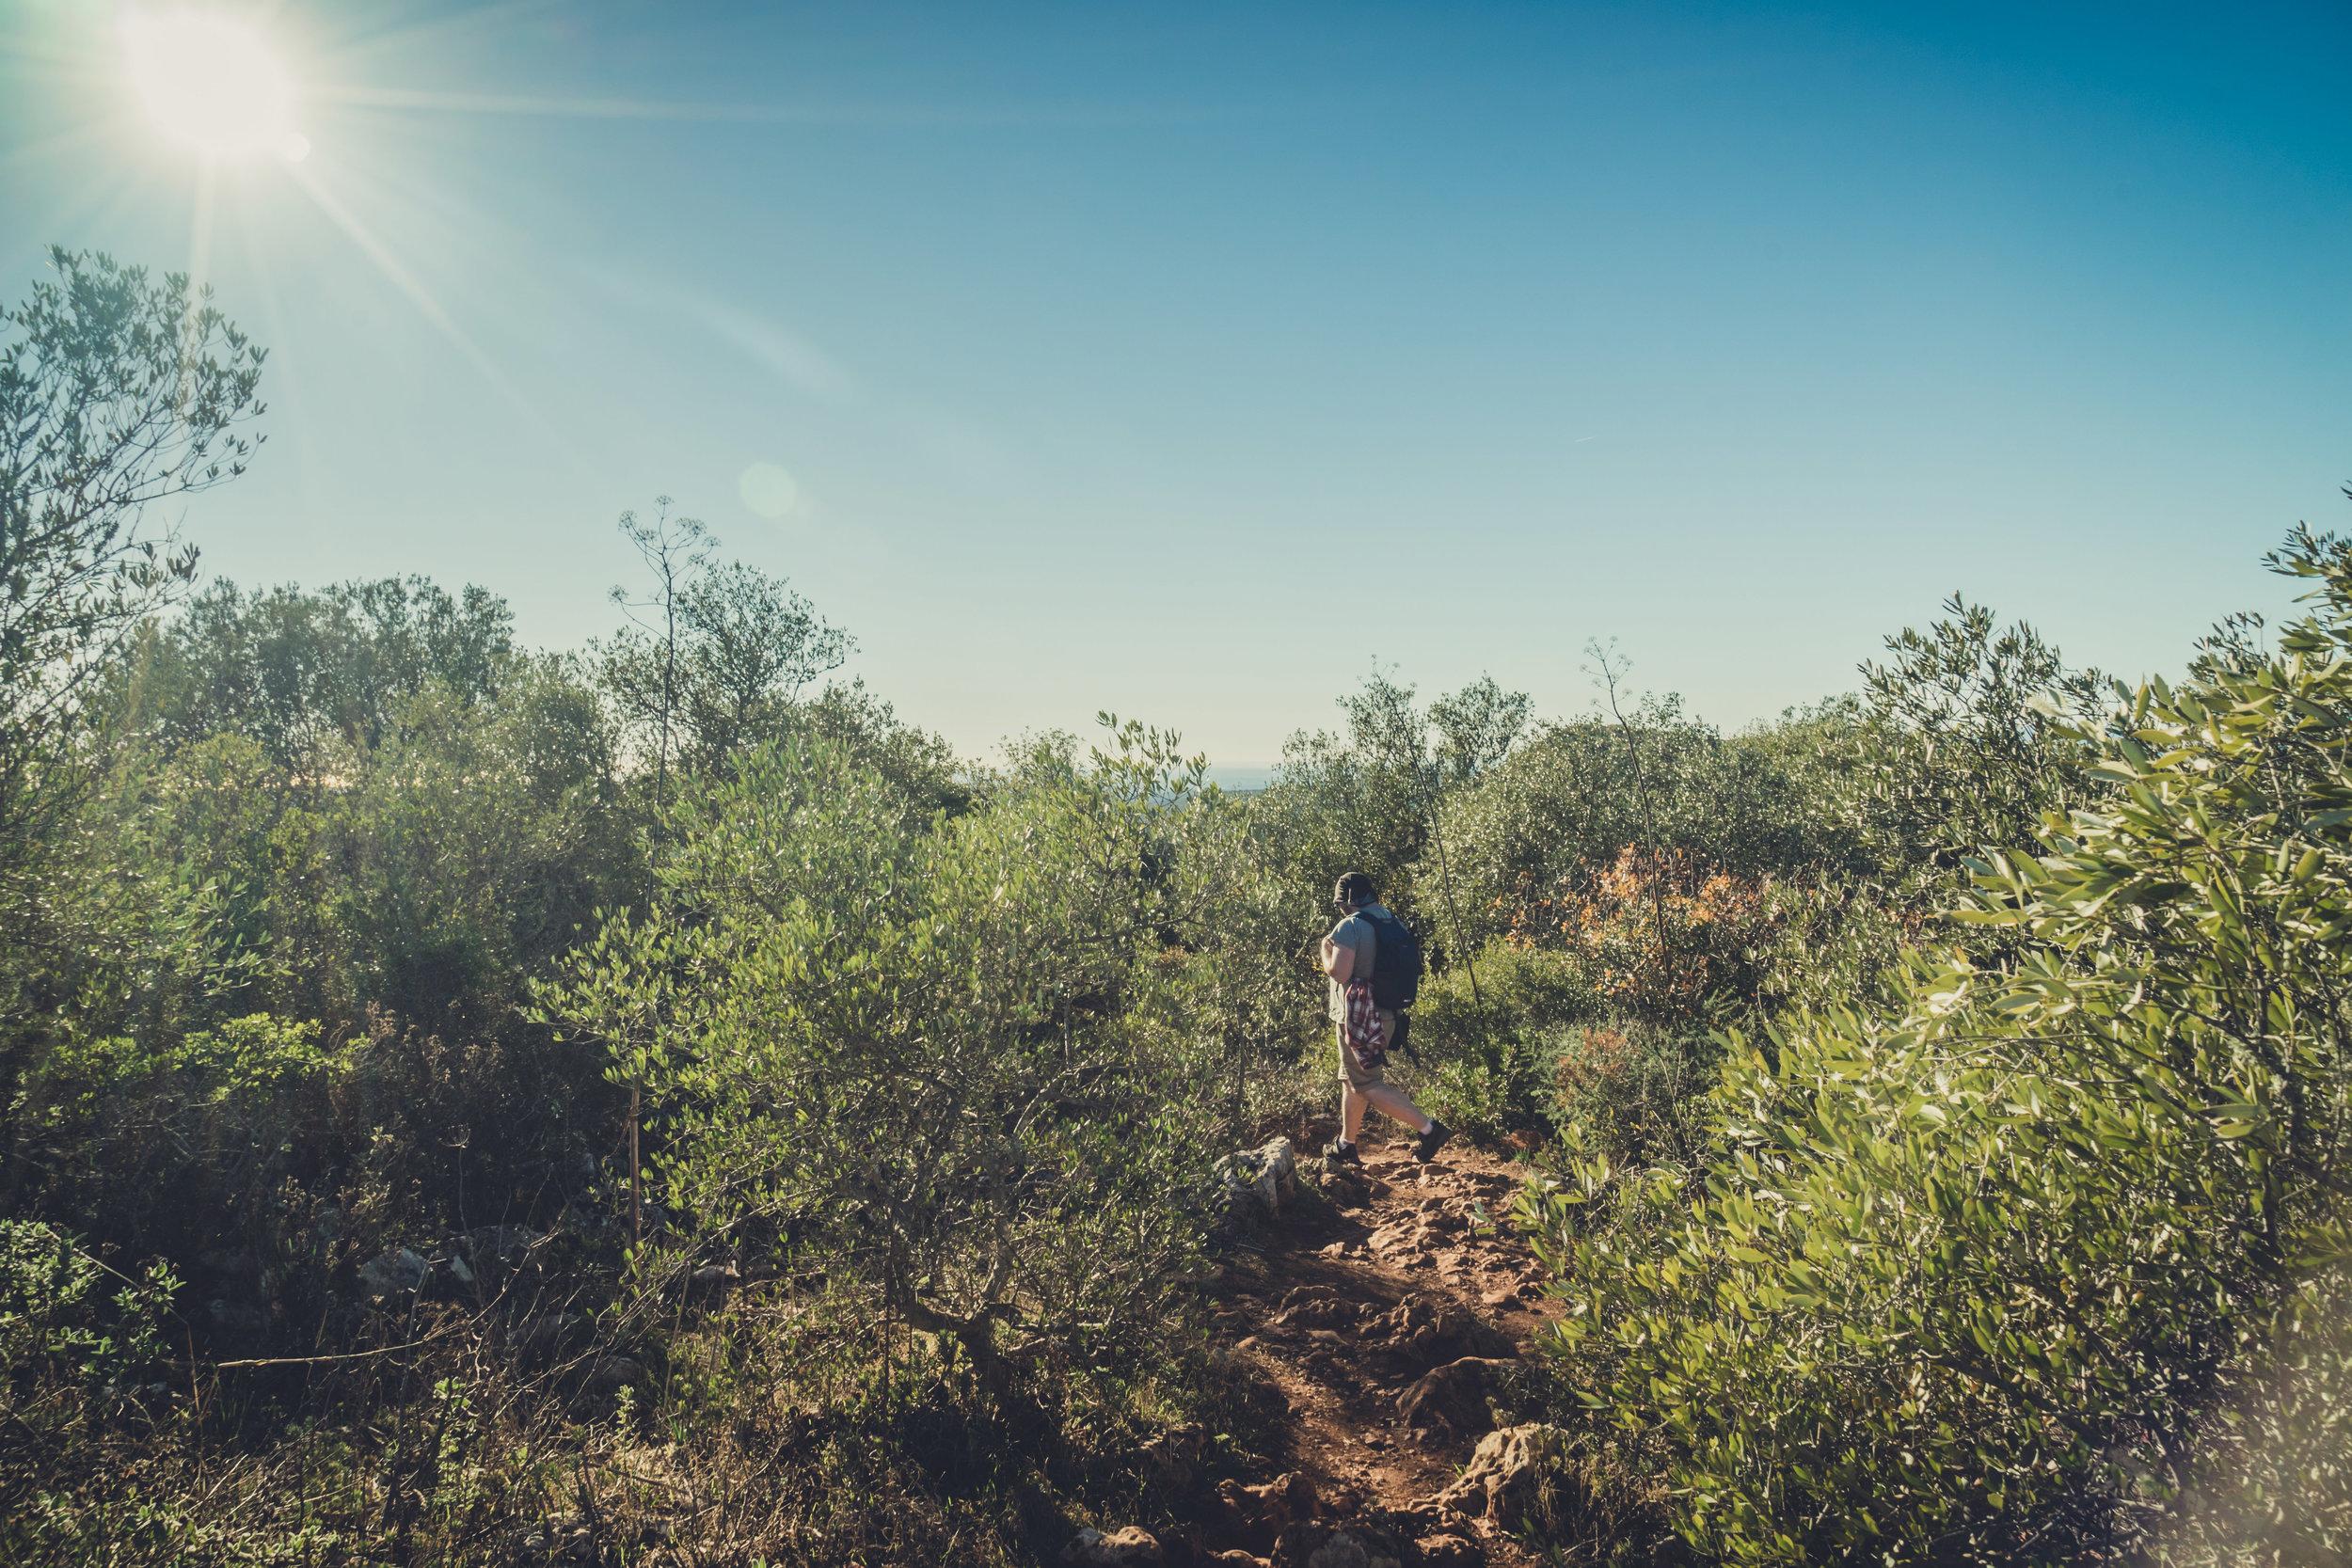 Hiking. algarve. portugal. talbe mountain. walking in the mountains. Rocha da Pena.. tree, view. green. lowepro...jpg